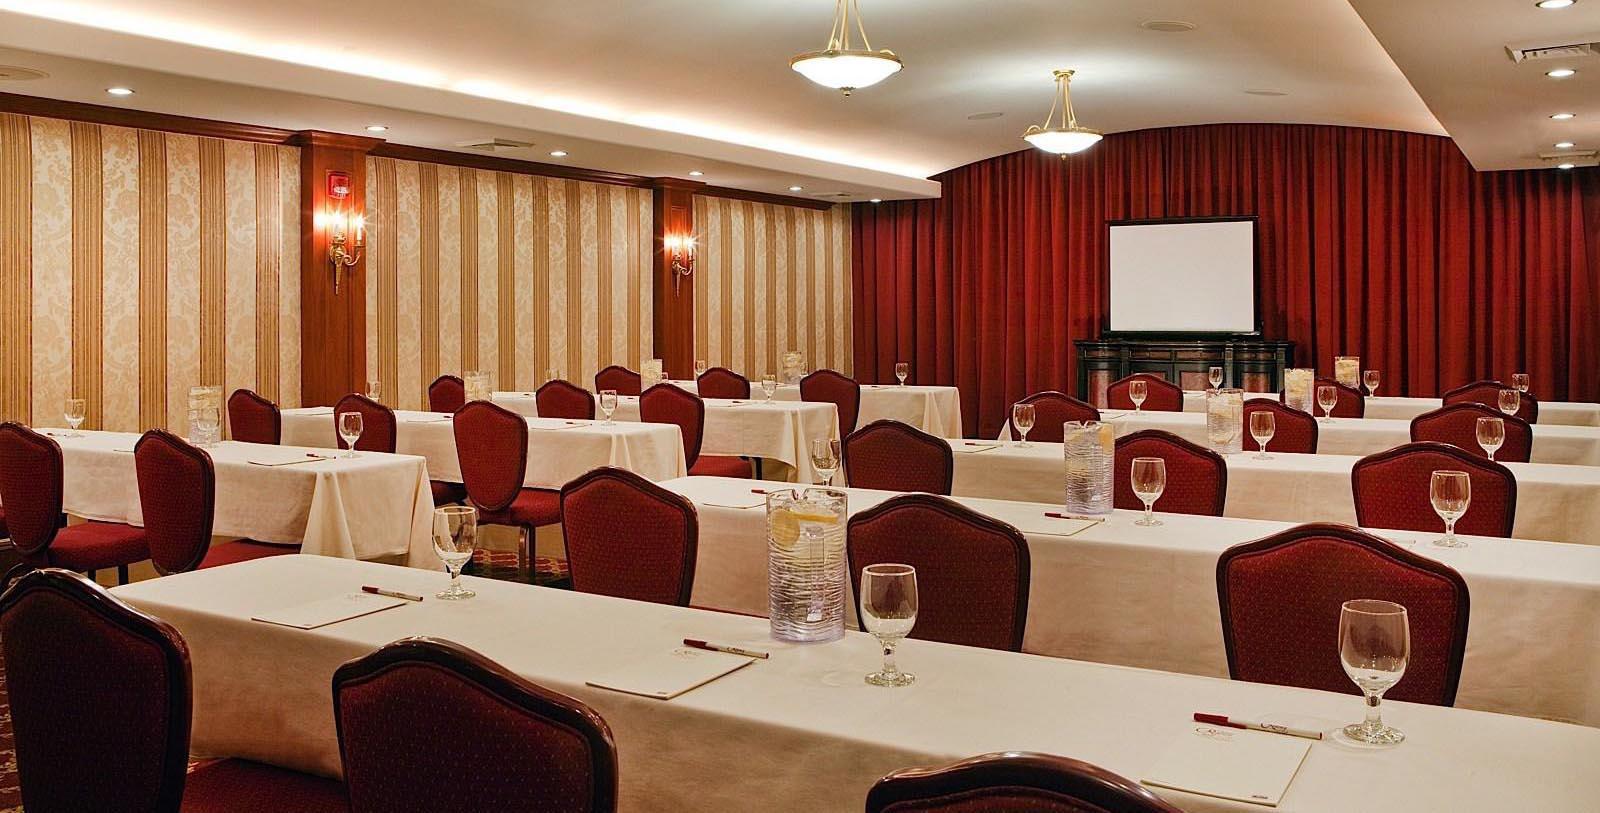 Image of Meeting Space Portland Regency Hotel & Spa, 1895, Member of Historic Hotels of America, in Portland Maine, Experience